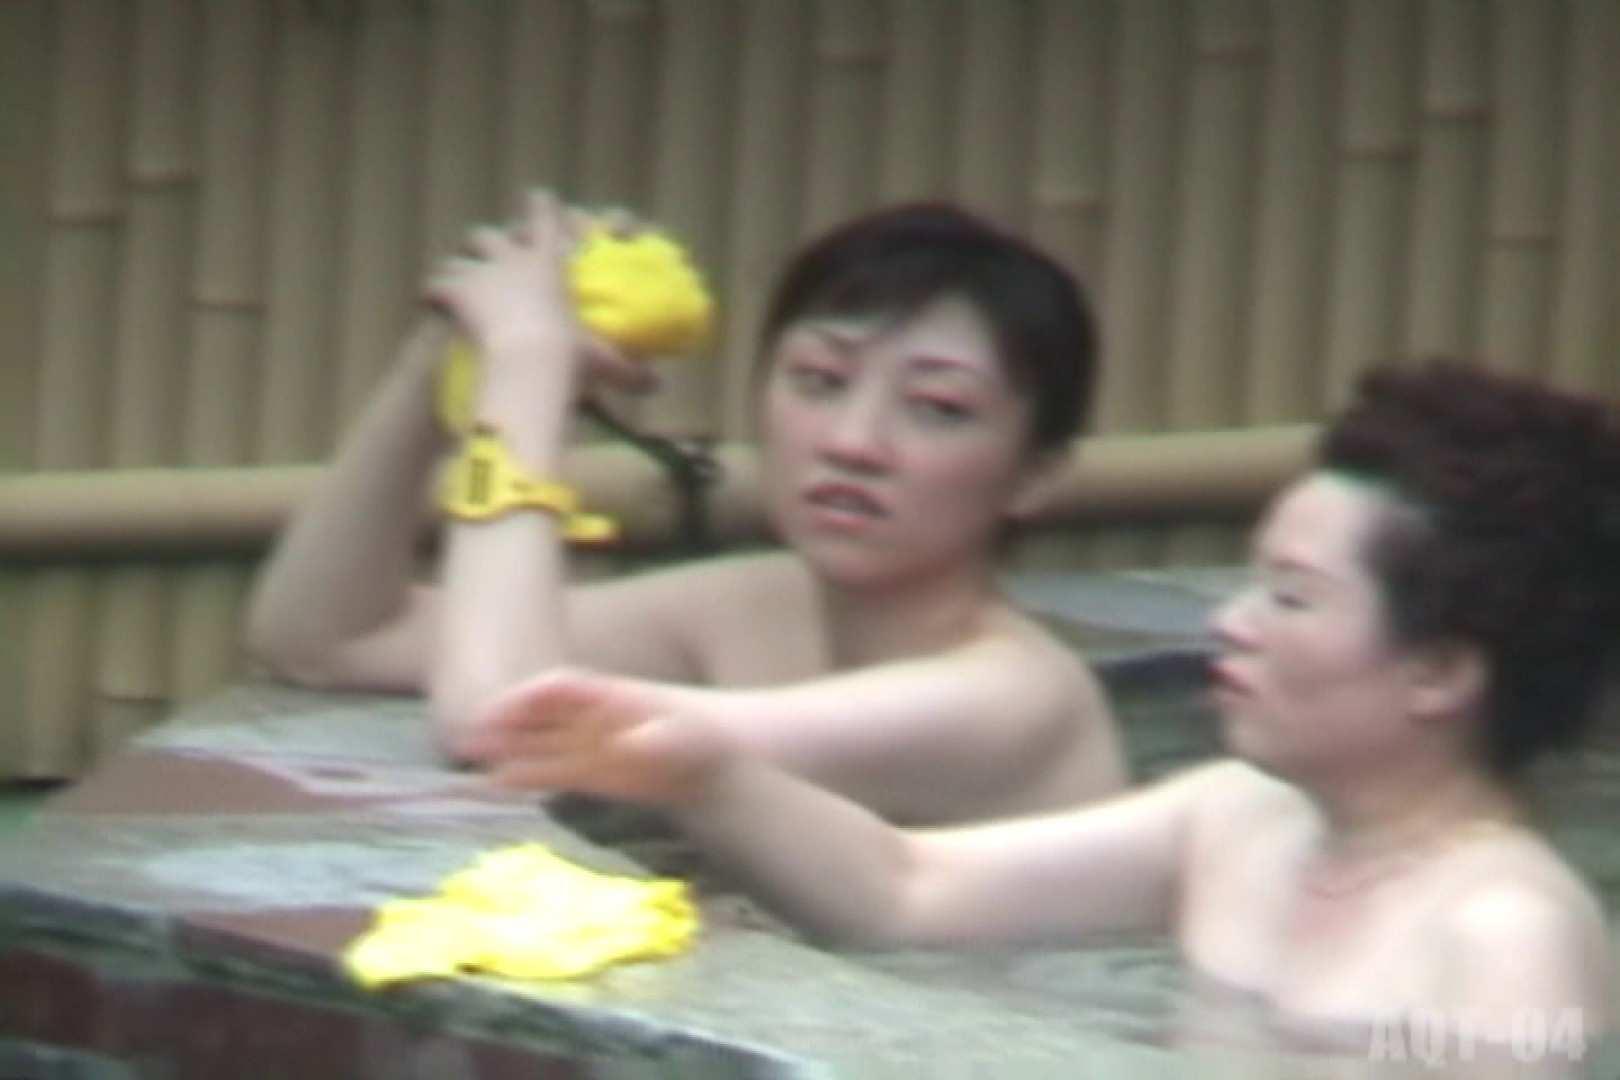 Aquaな露天風呂Vol.743 盗撮映像  75Pix 13